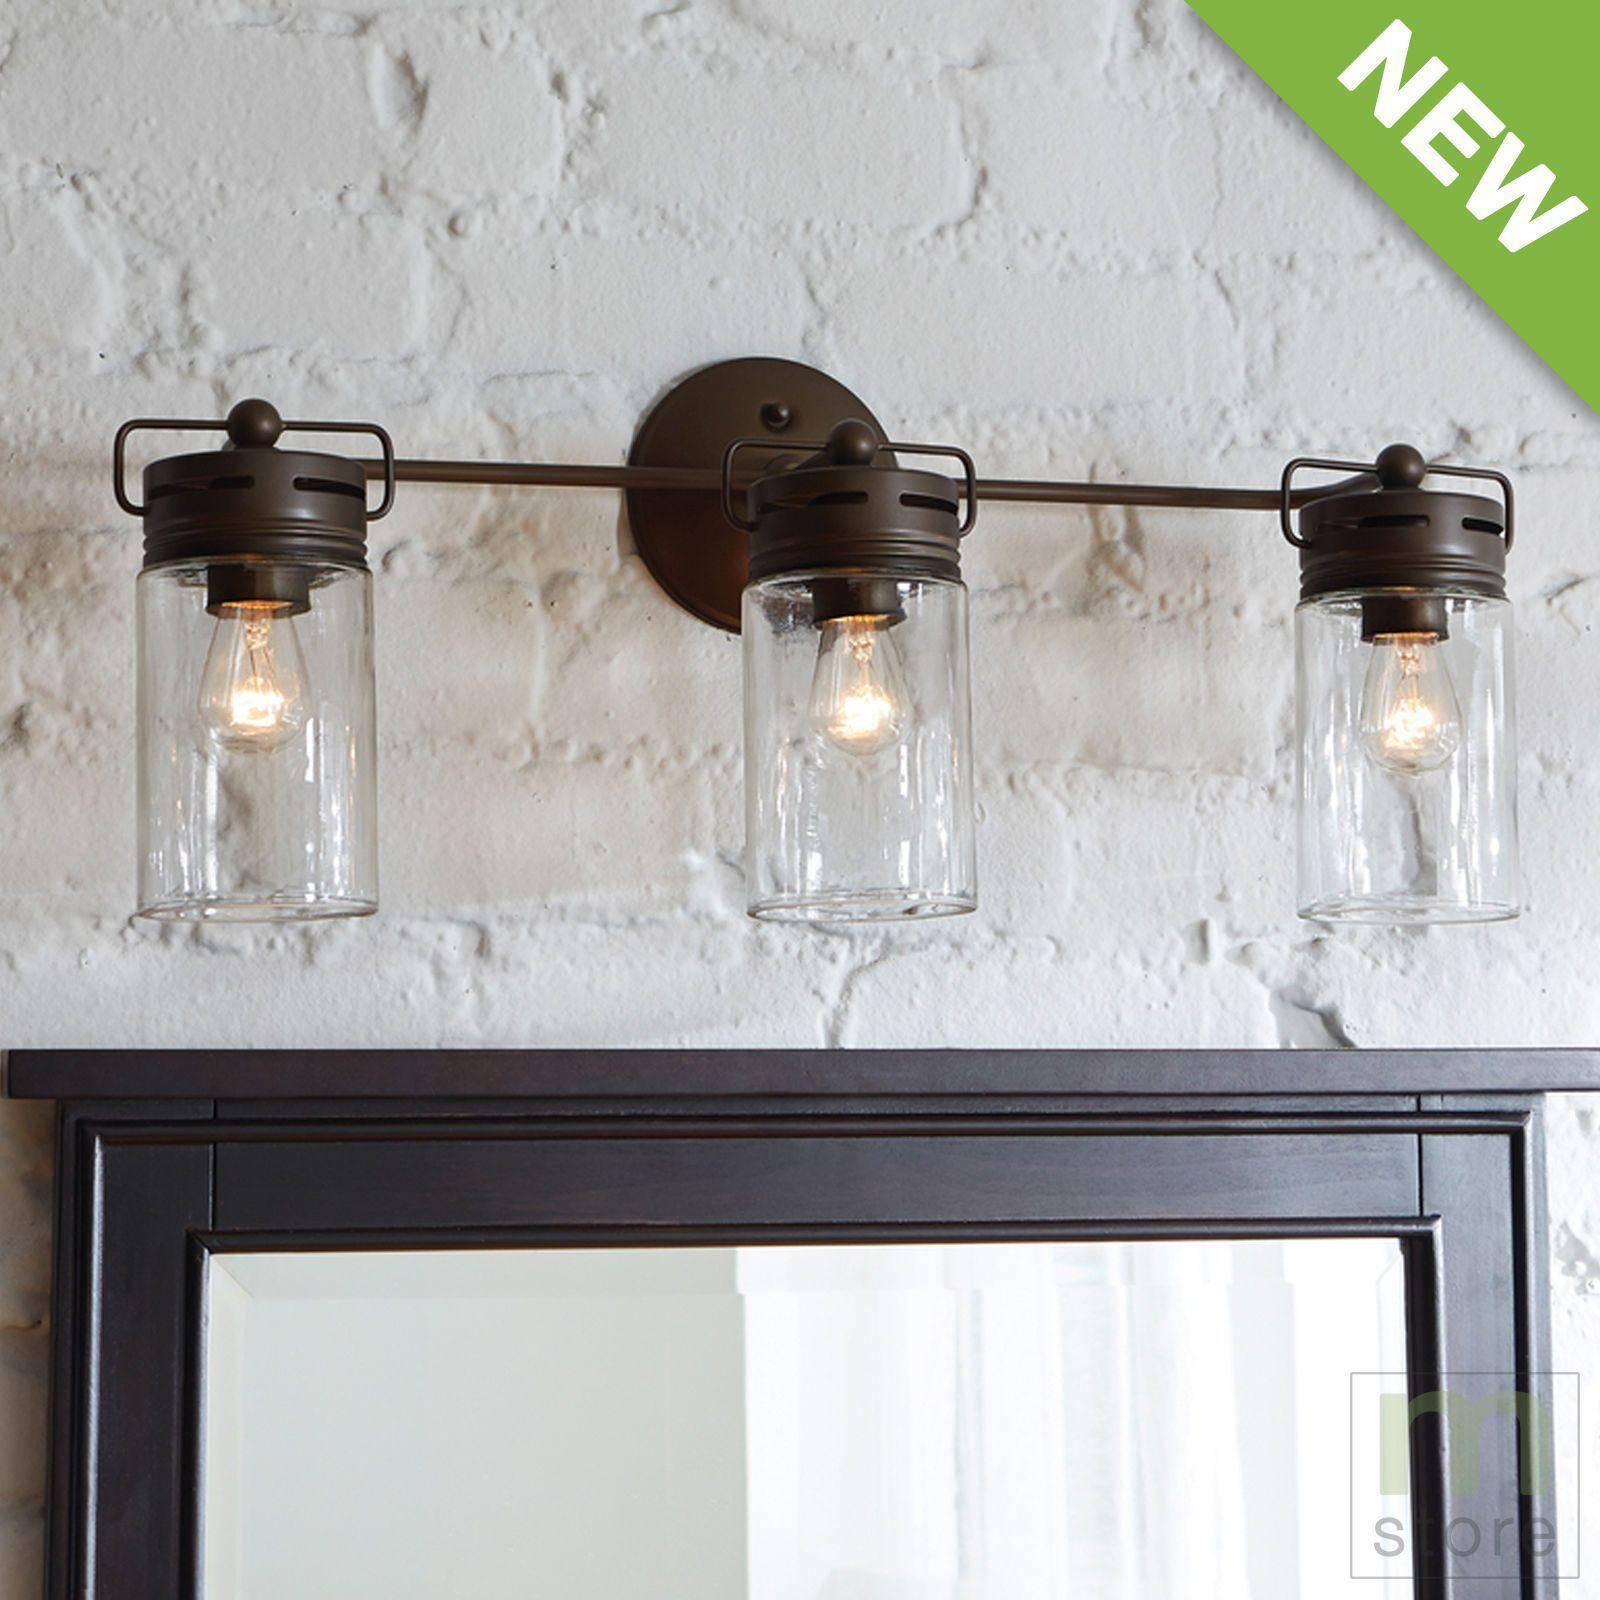 Details About Bathroom Vanity 3 Light Fixture Aged Bronze Mason